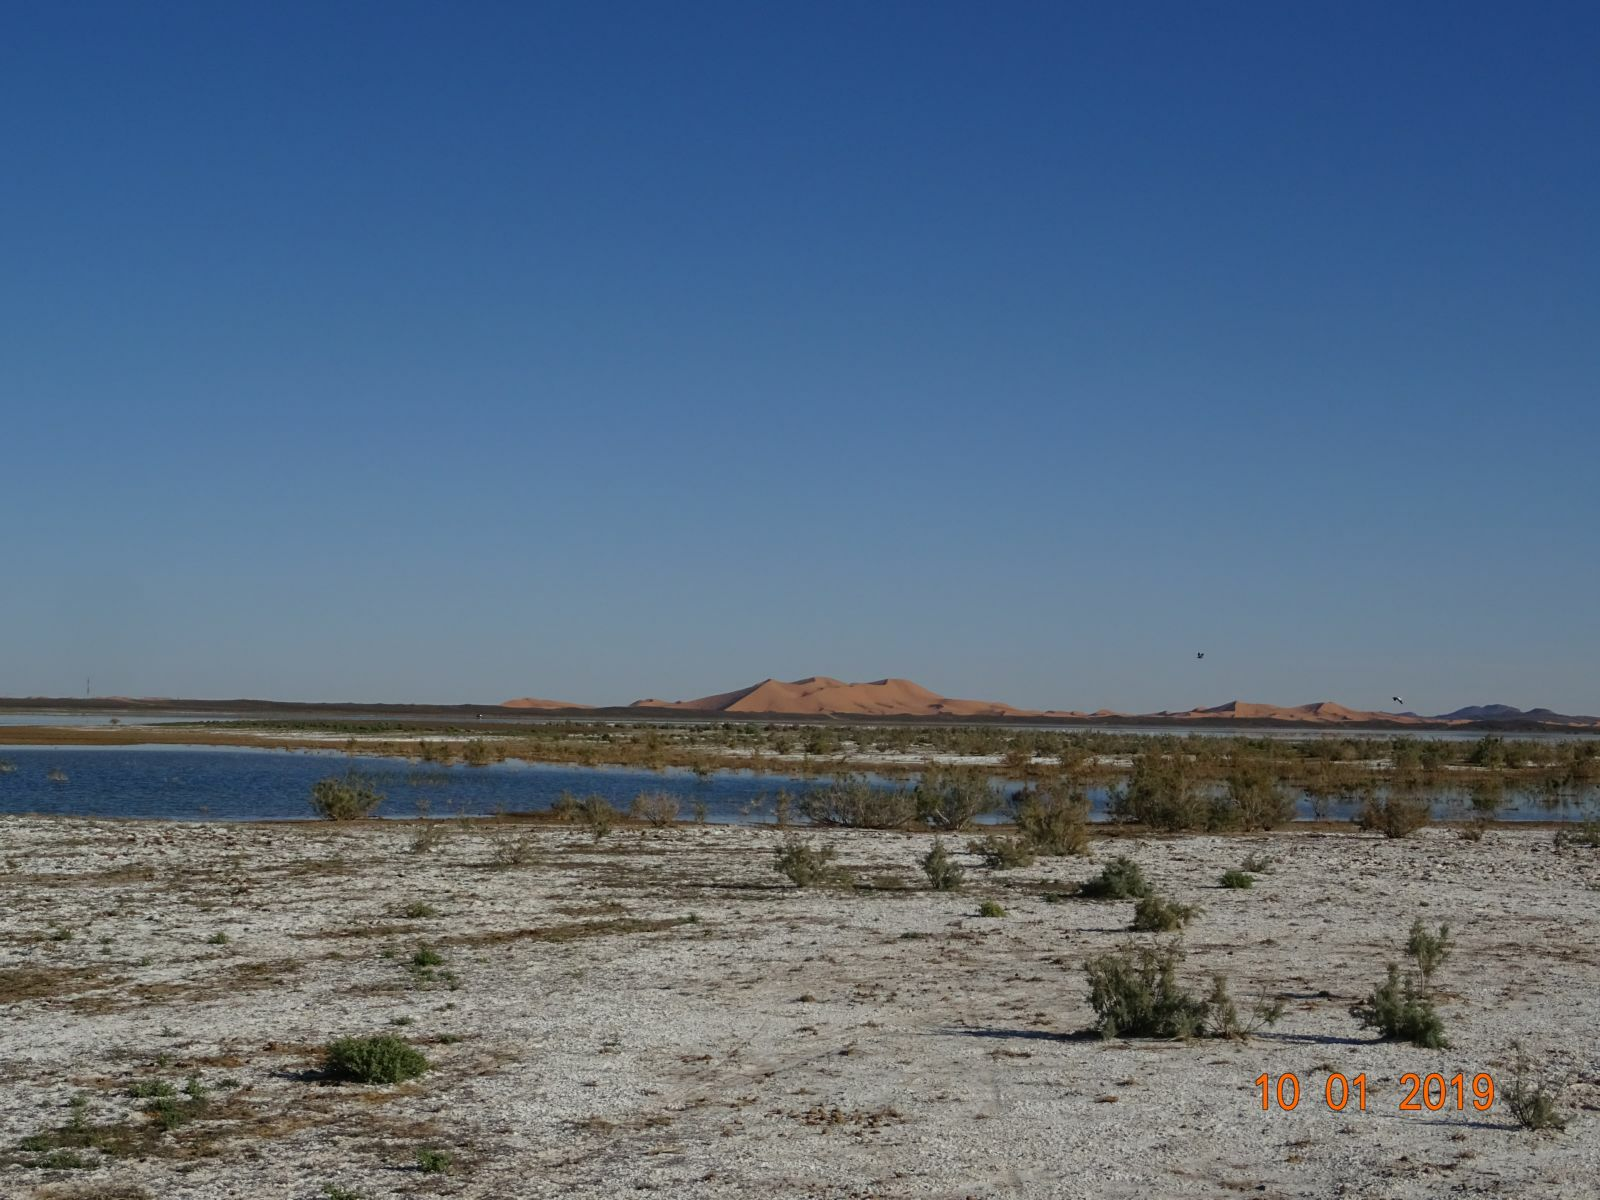 Le lac de merzouga